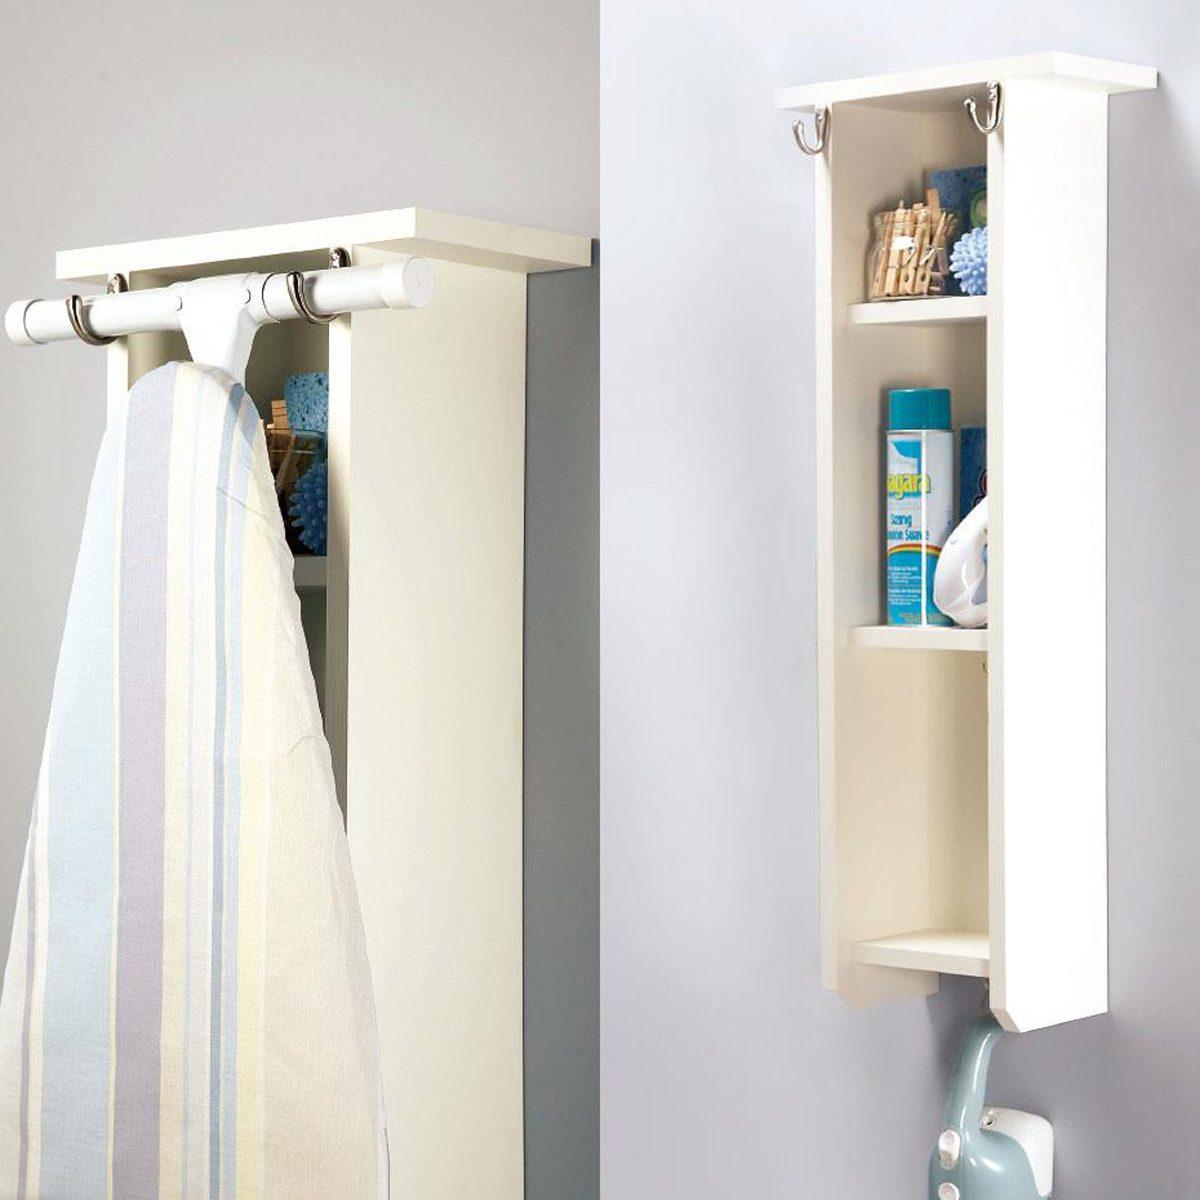 25 Cheap Laundry Room Ideas You Can Diy Today Family Handyman